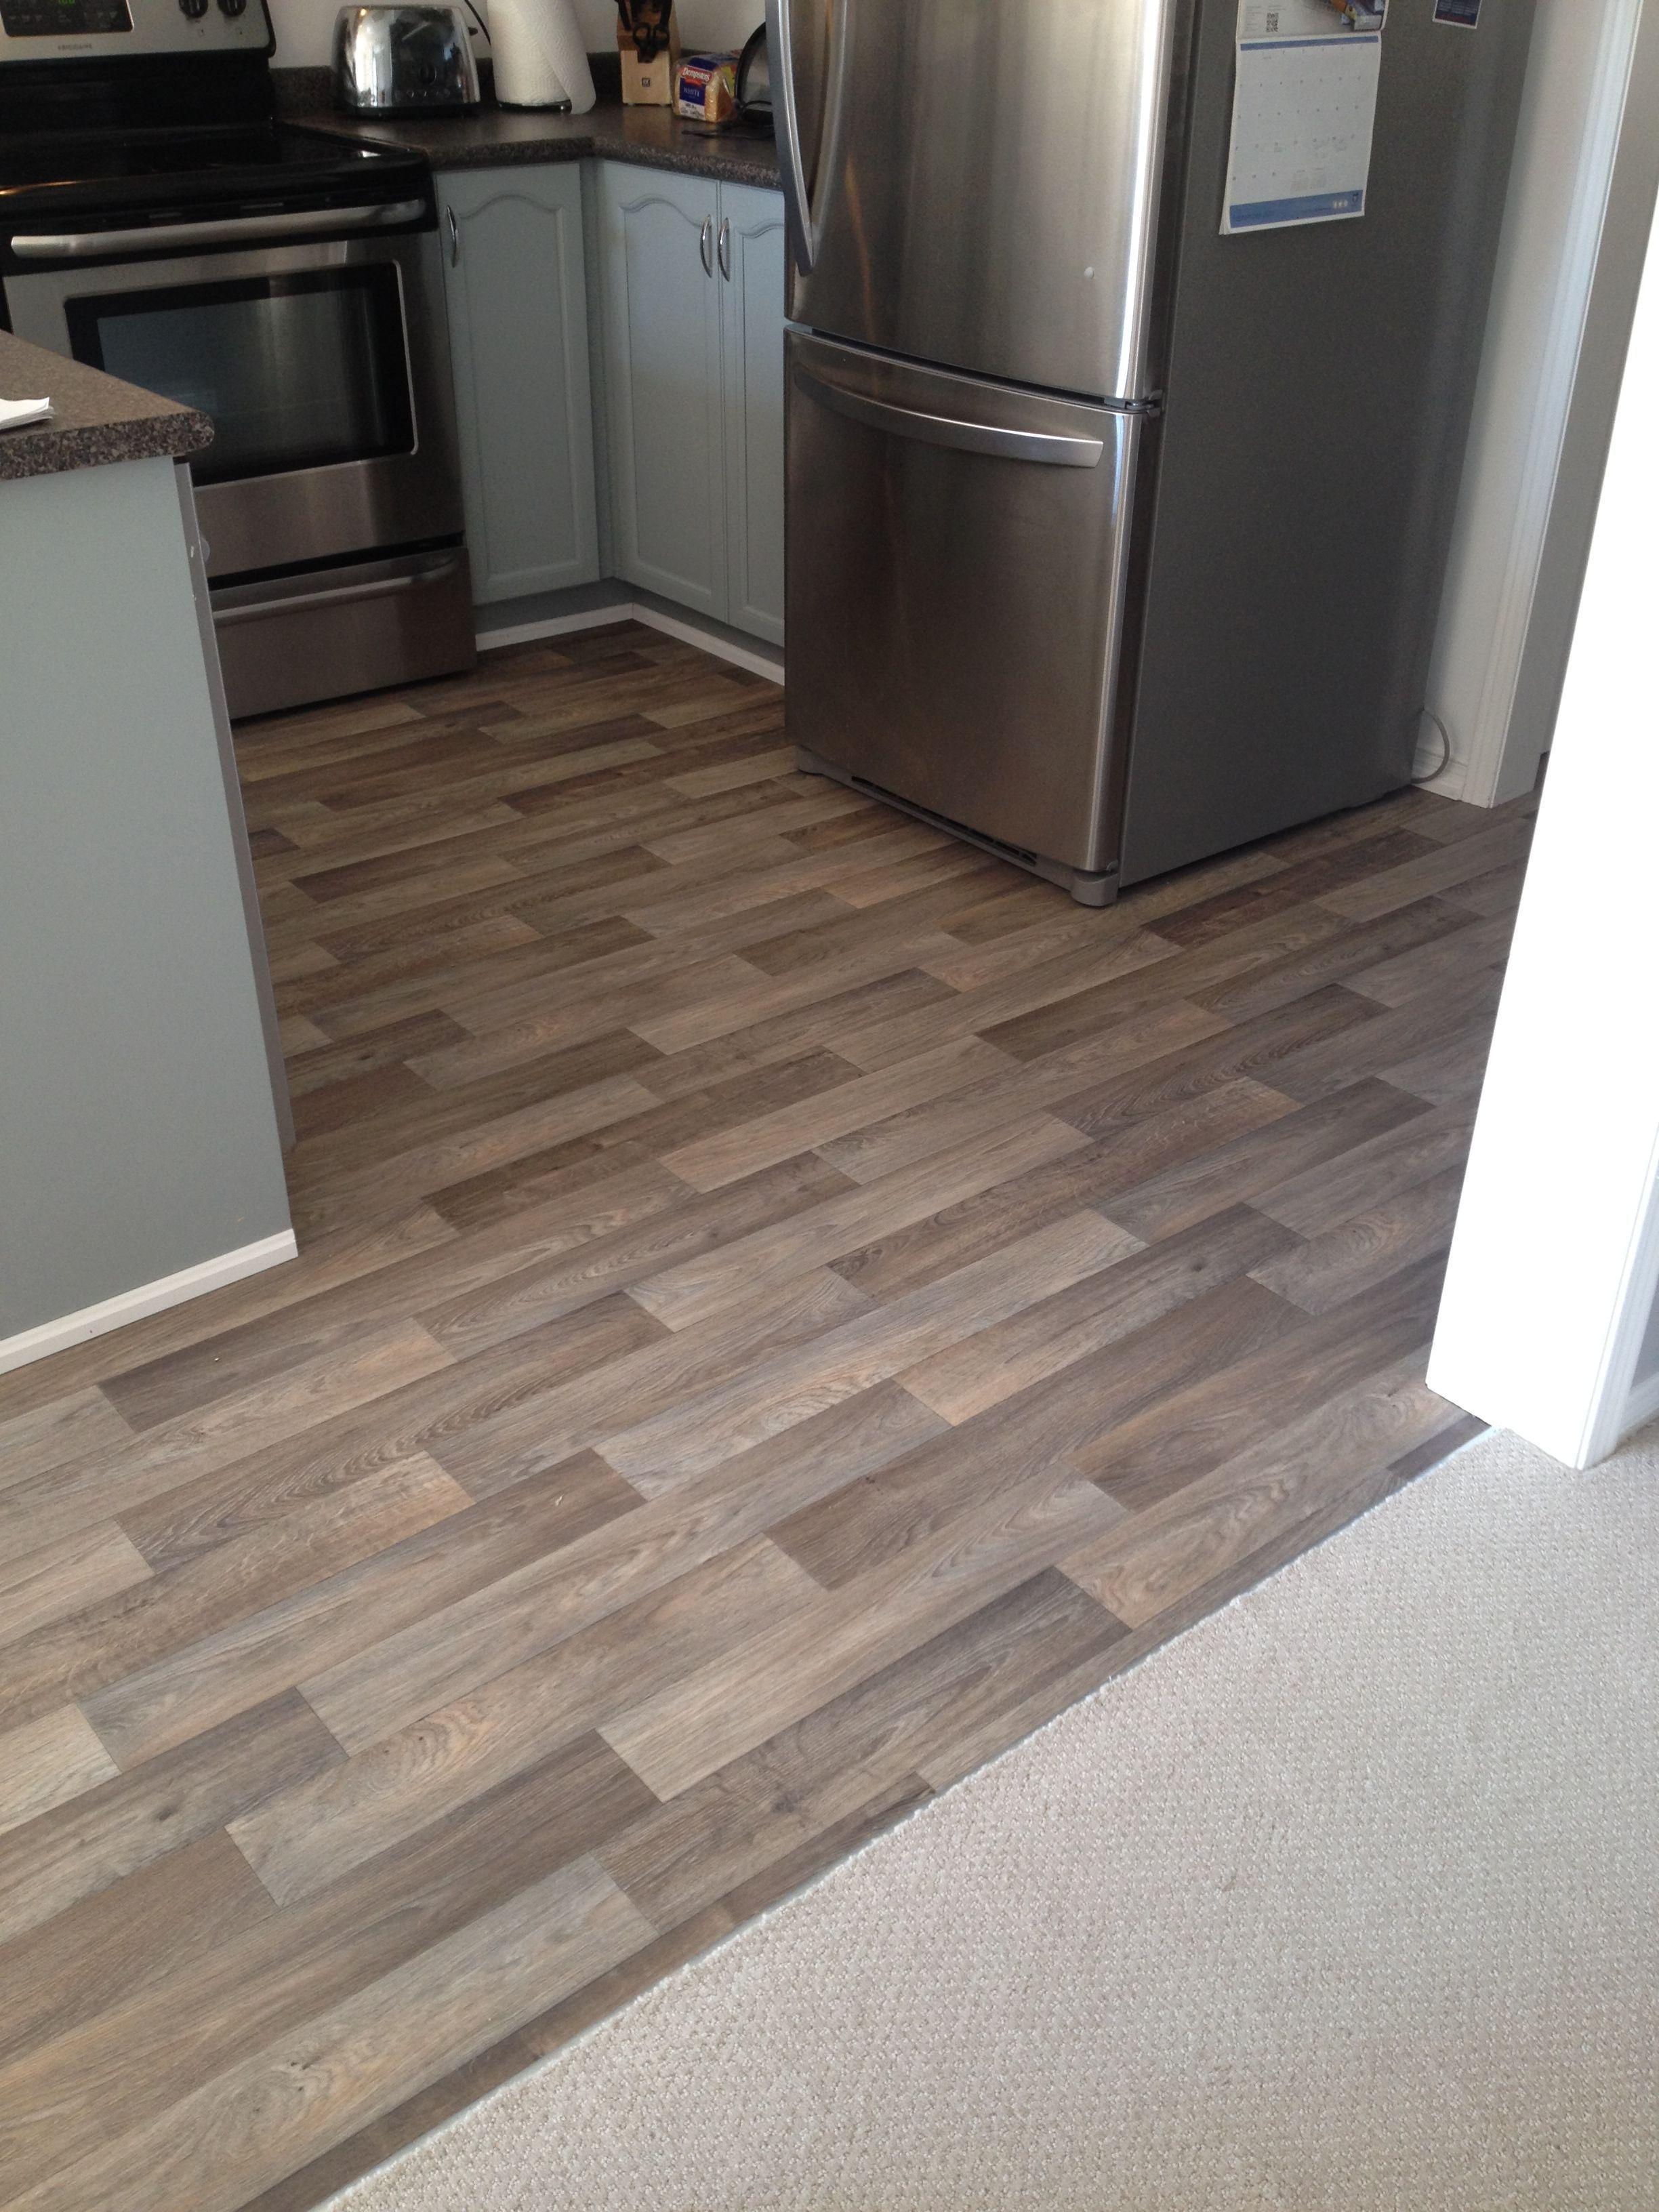 best 35 kitchen flooring ideas pictures for your kitchen design new con imágenes pisos on kitchen flooring ideas id=49042